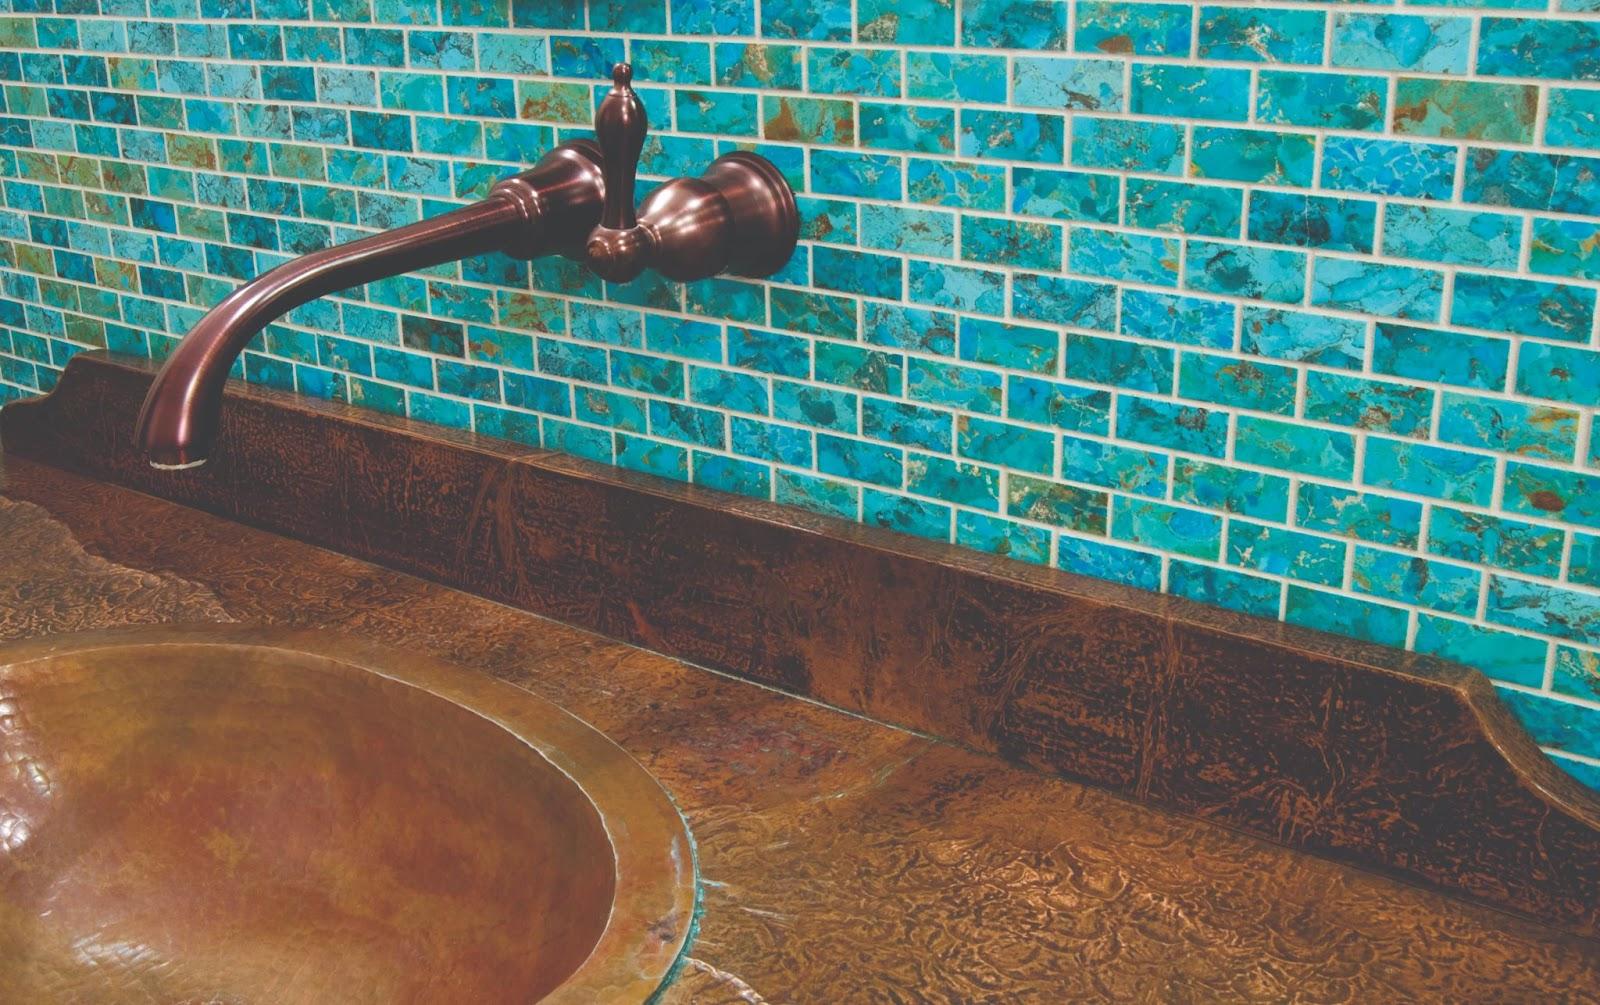 Turquoise subway tile bathroom backsplash in a natural look